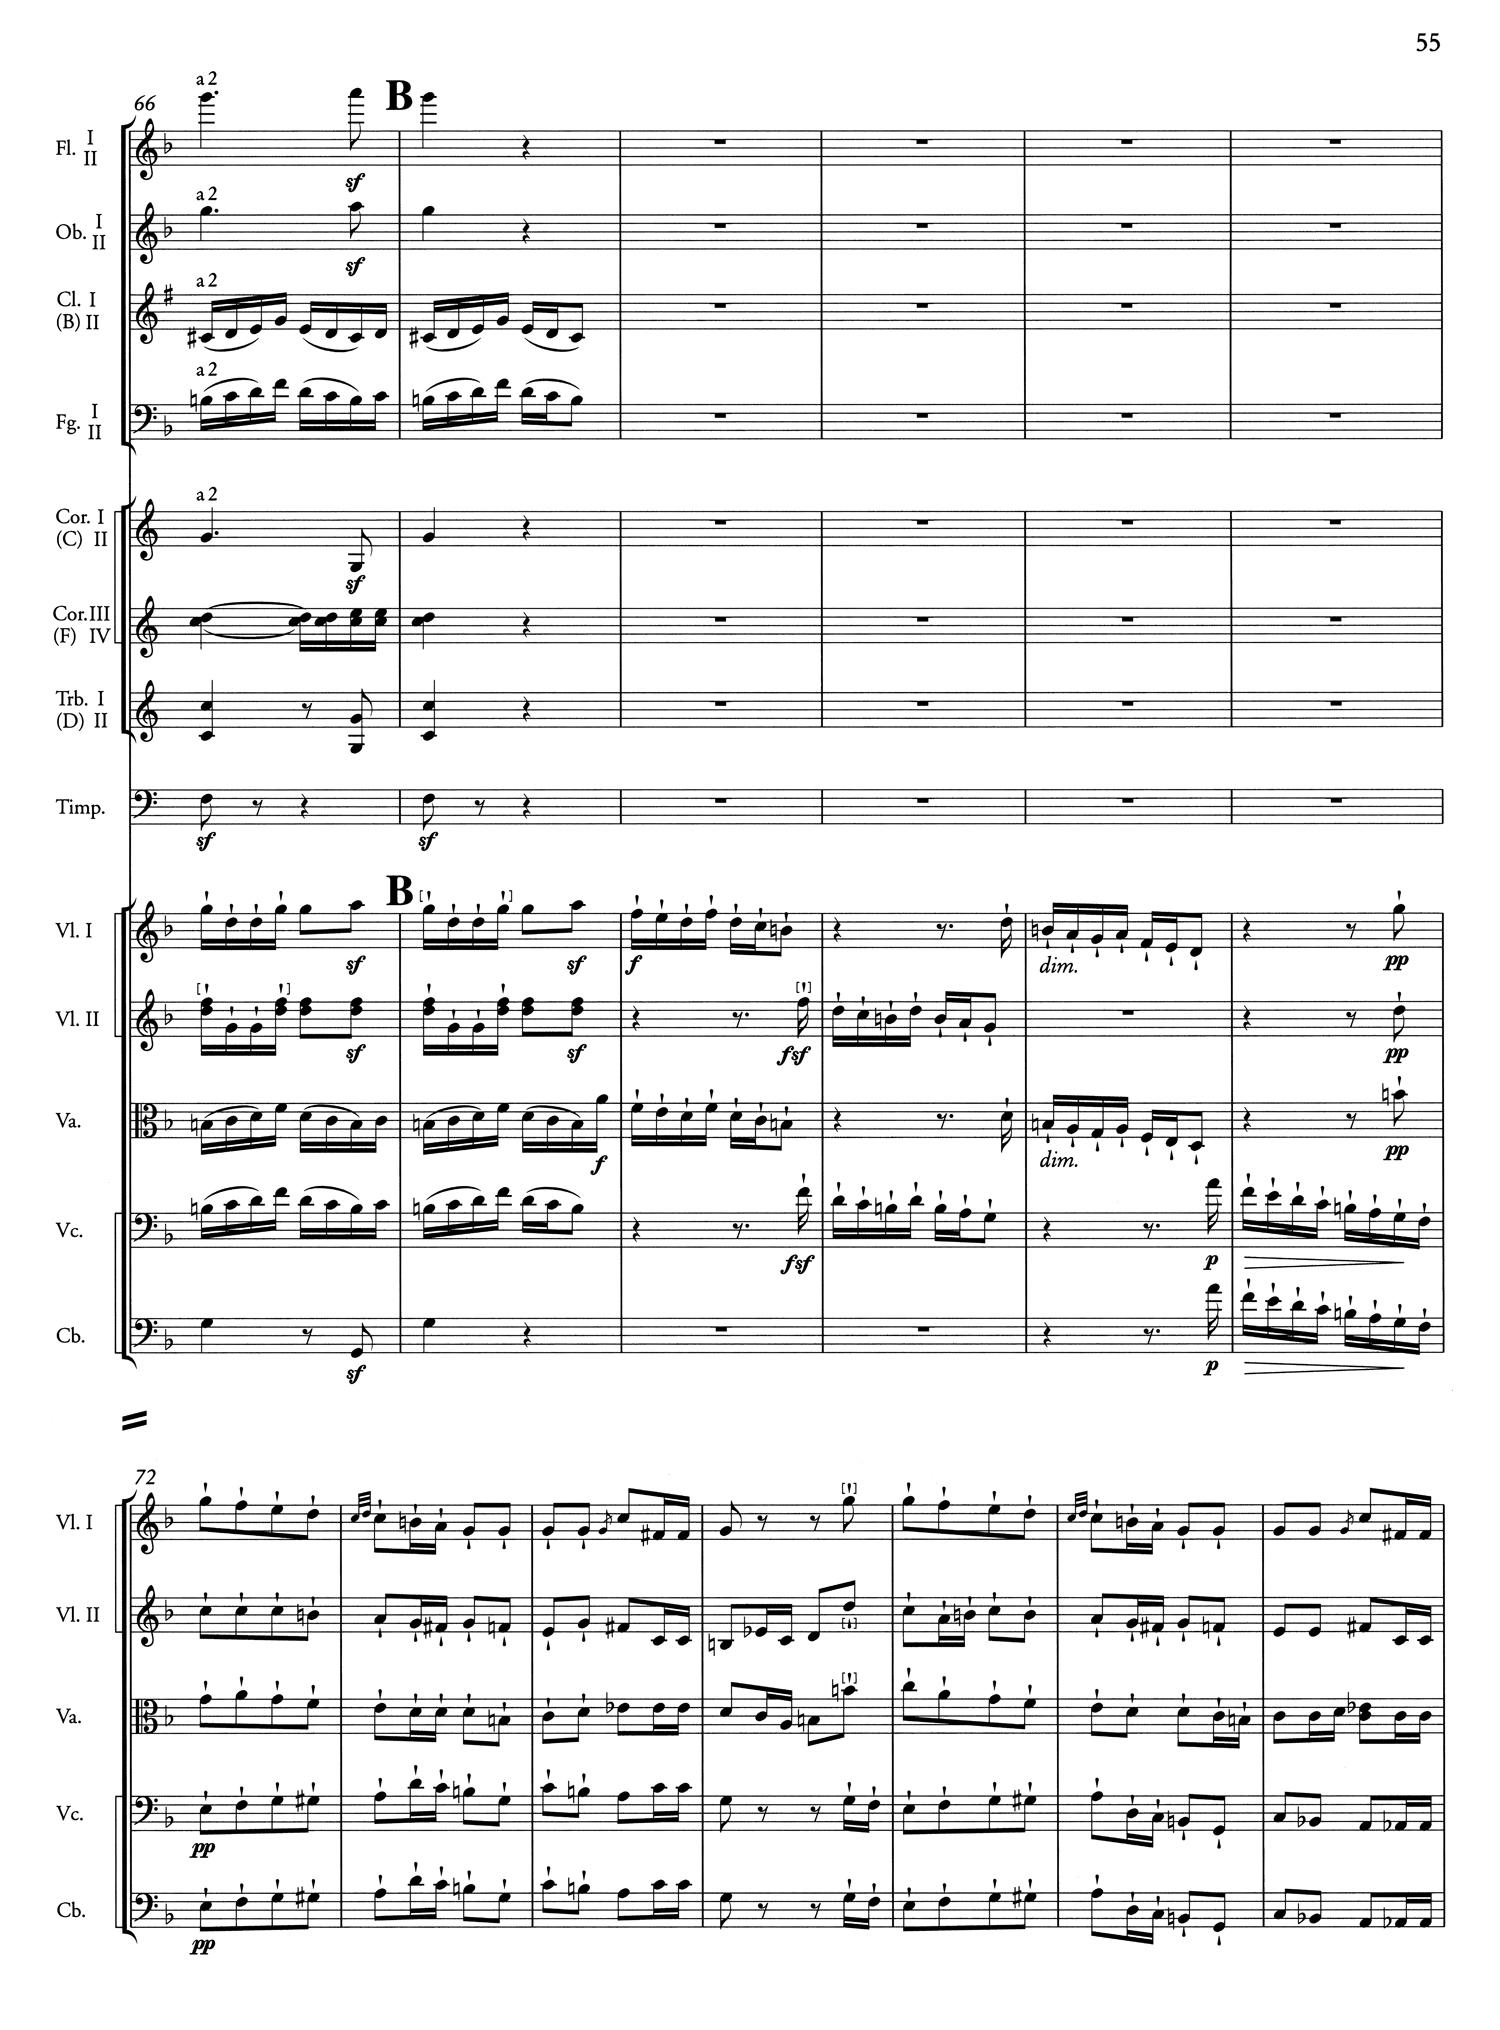 Mendelssohn Score Page 4.jpg